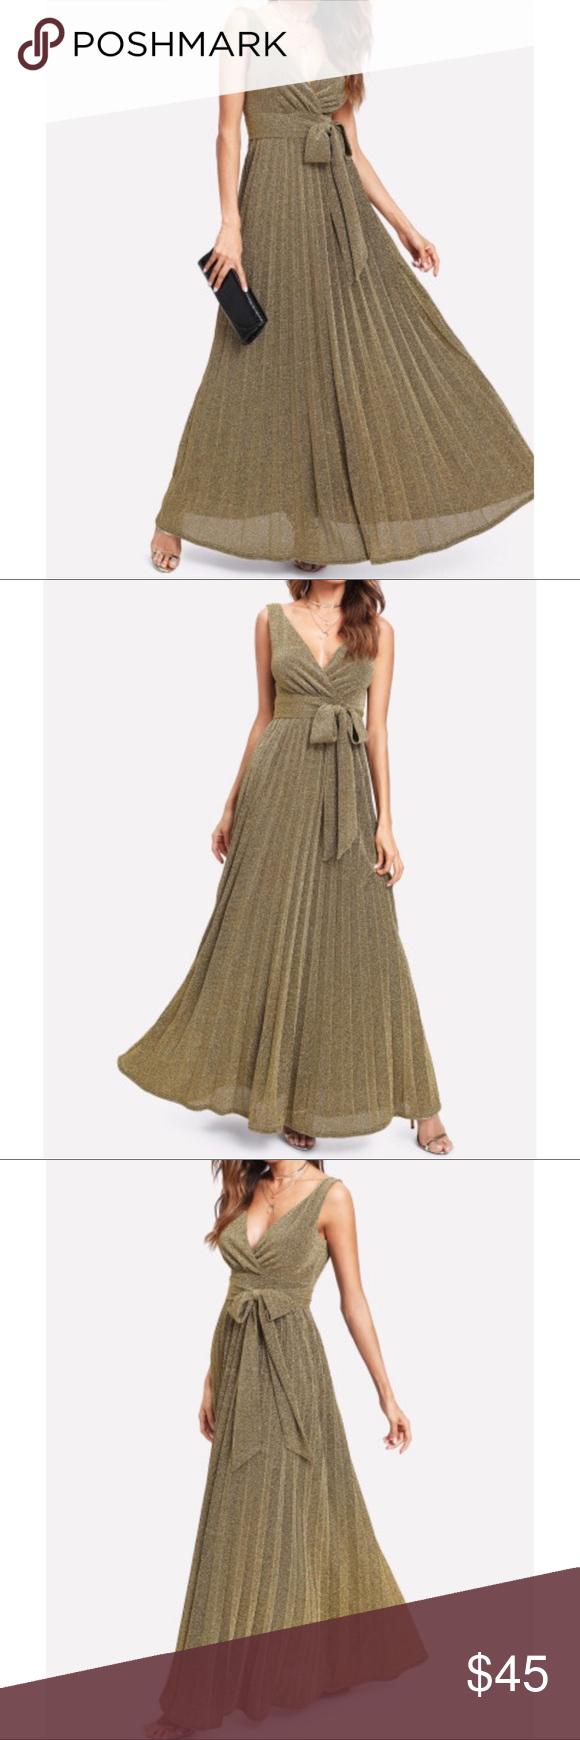 272693b52b09 Spotted while shopping on Poshmark: V Neck Self belted glitter pleated  surplice dress! #poshmark #fashion #shopping #style #Dresses & Skirts